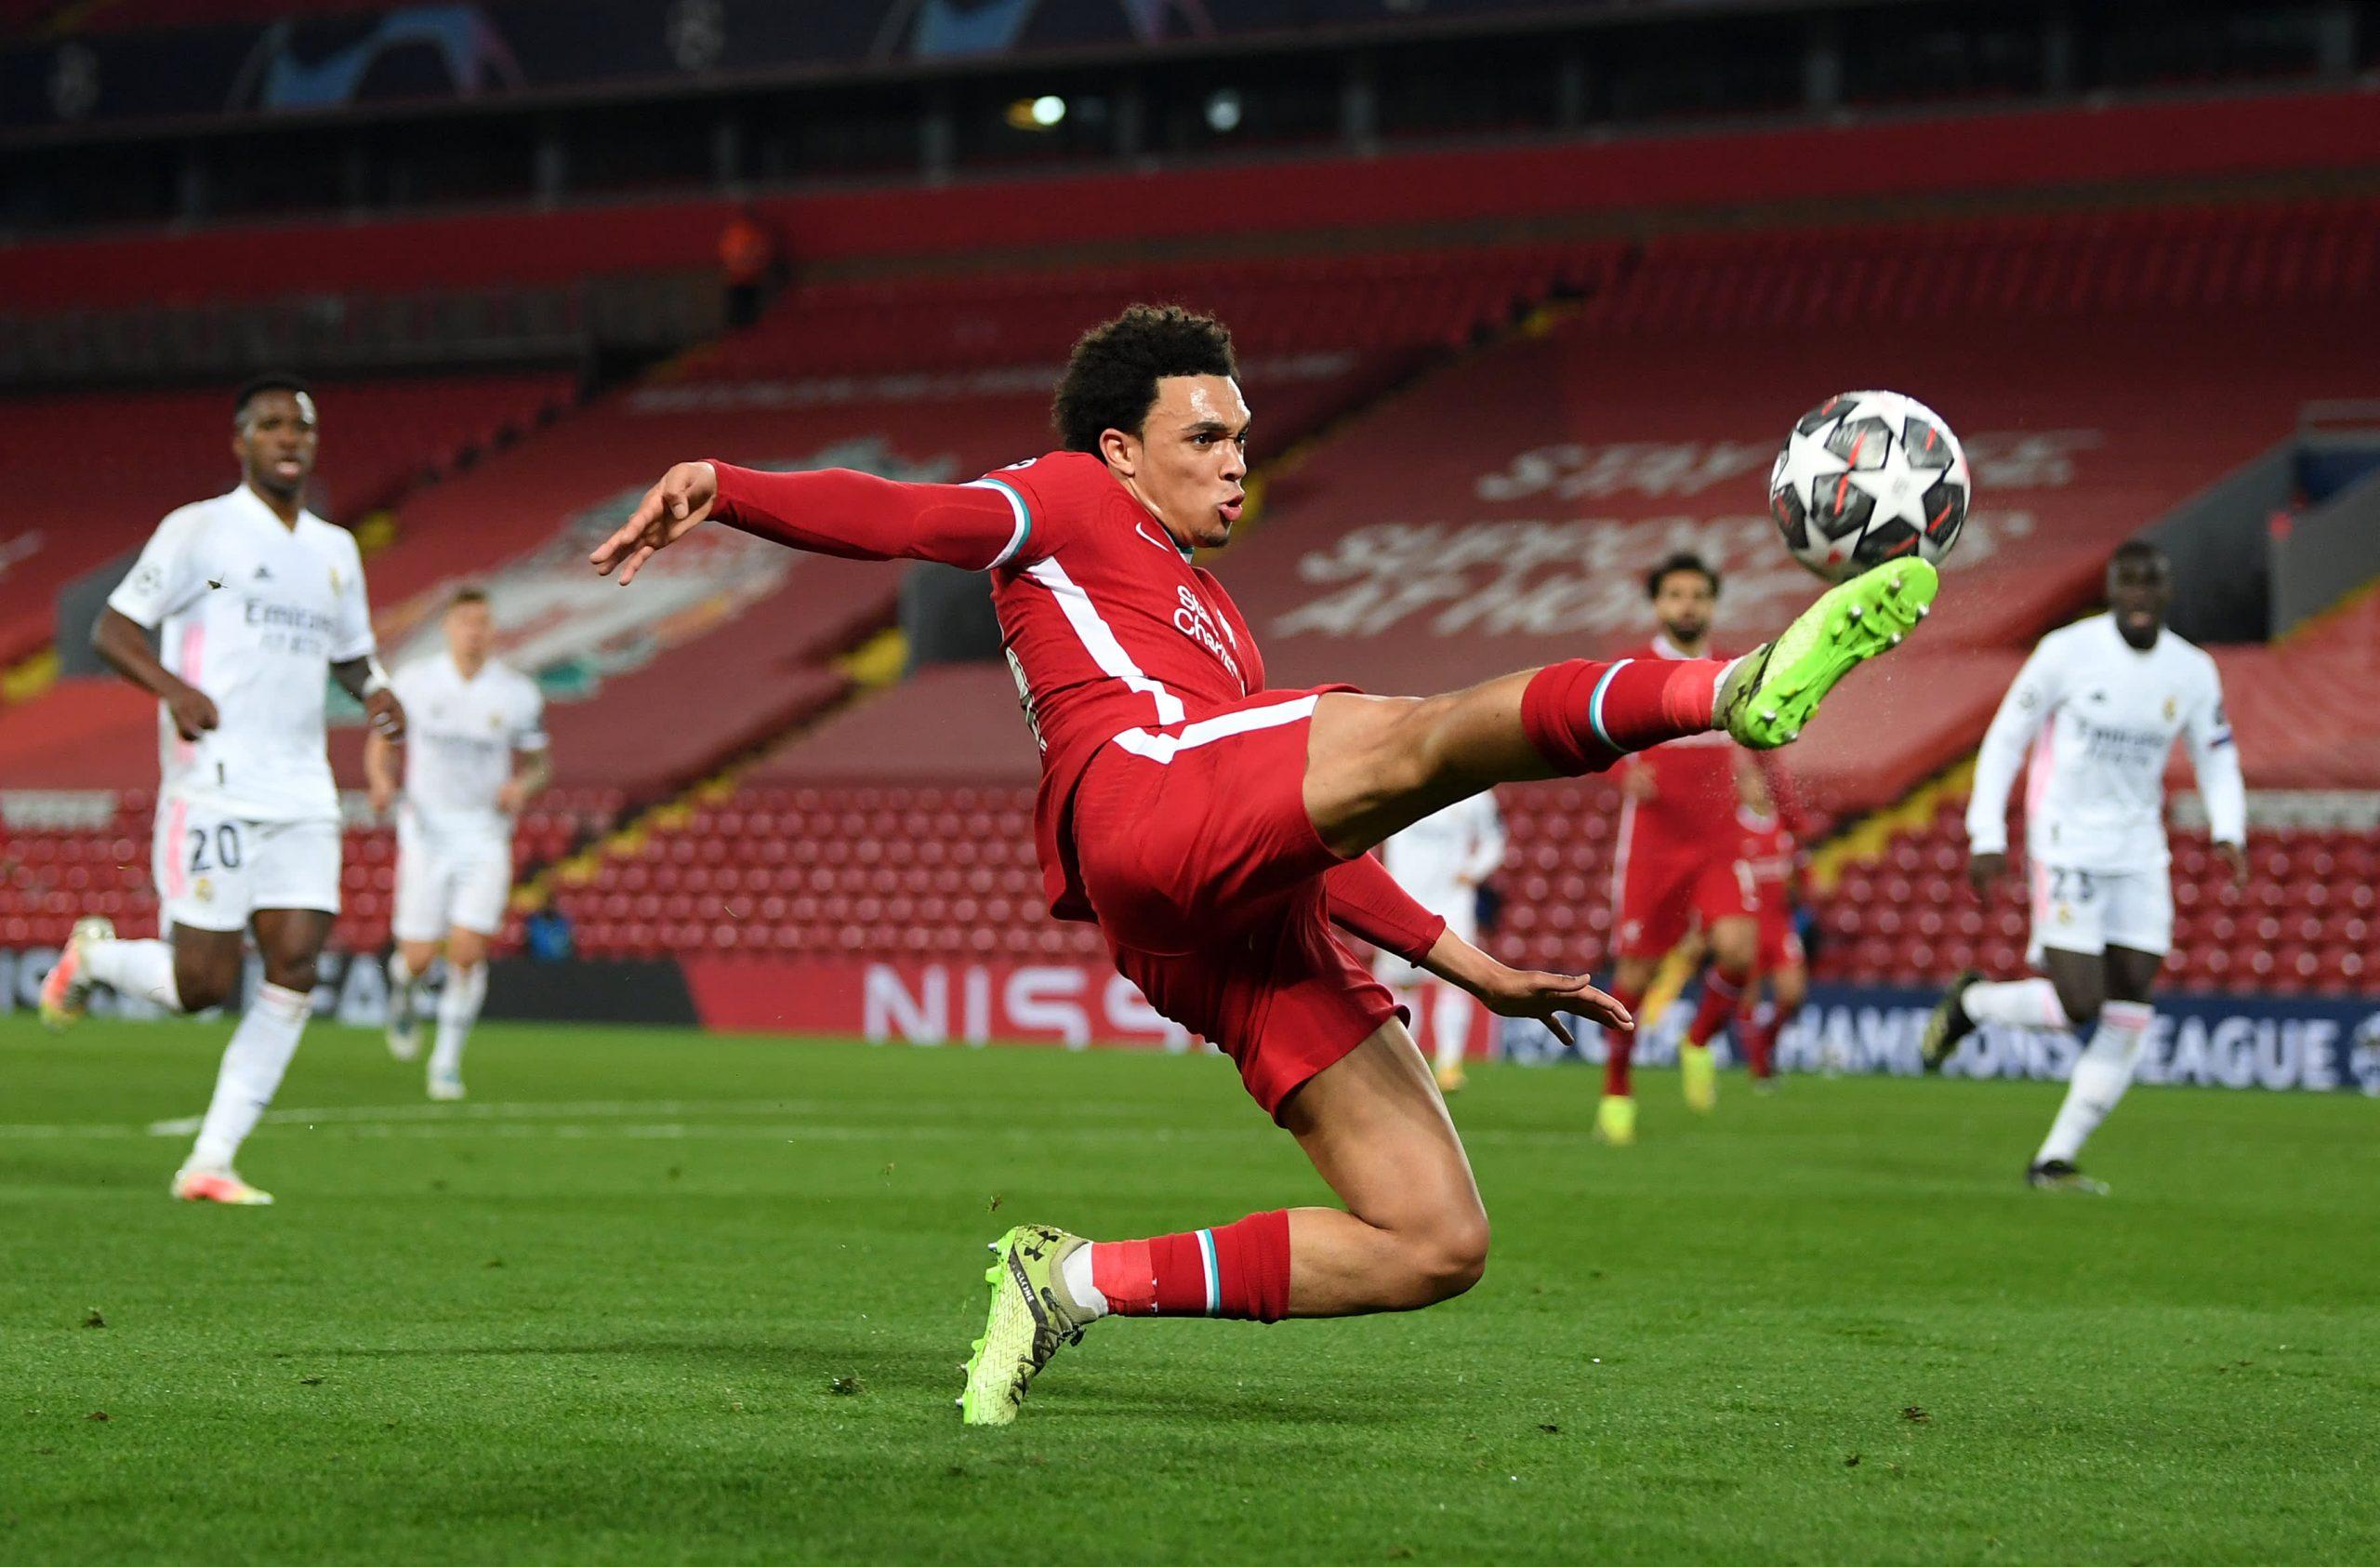 european-super-league-announces-12-football-clubs-6-from-england